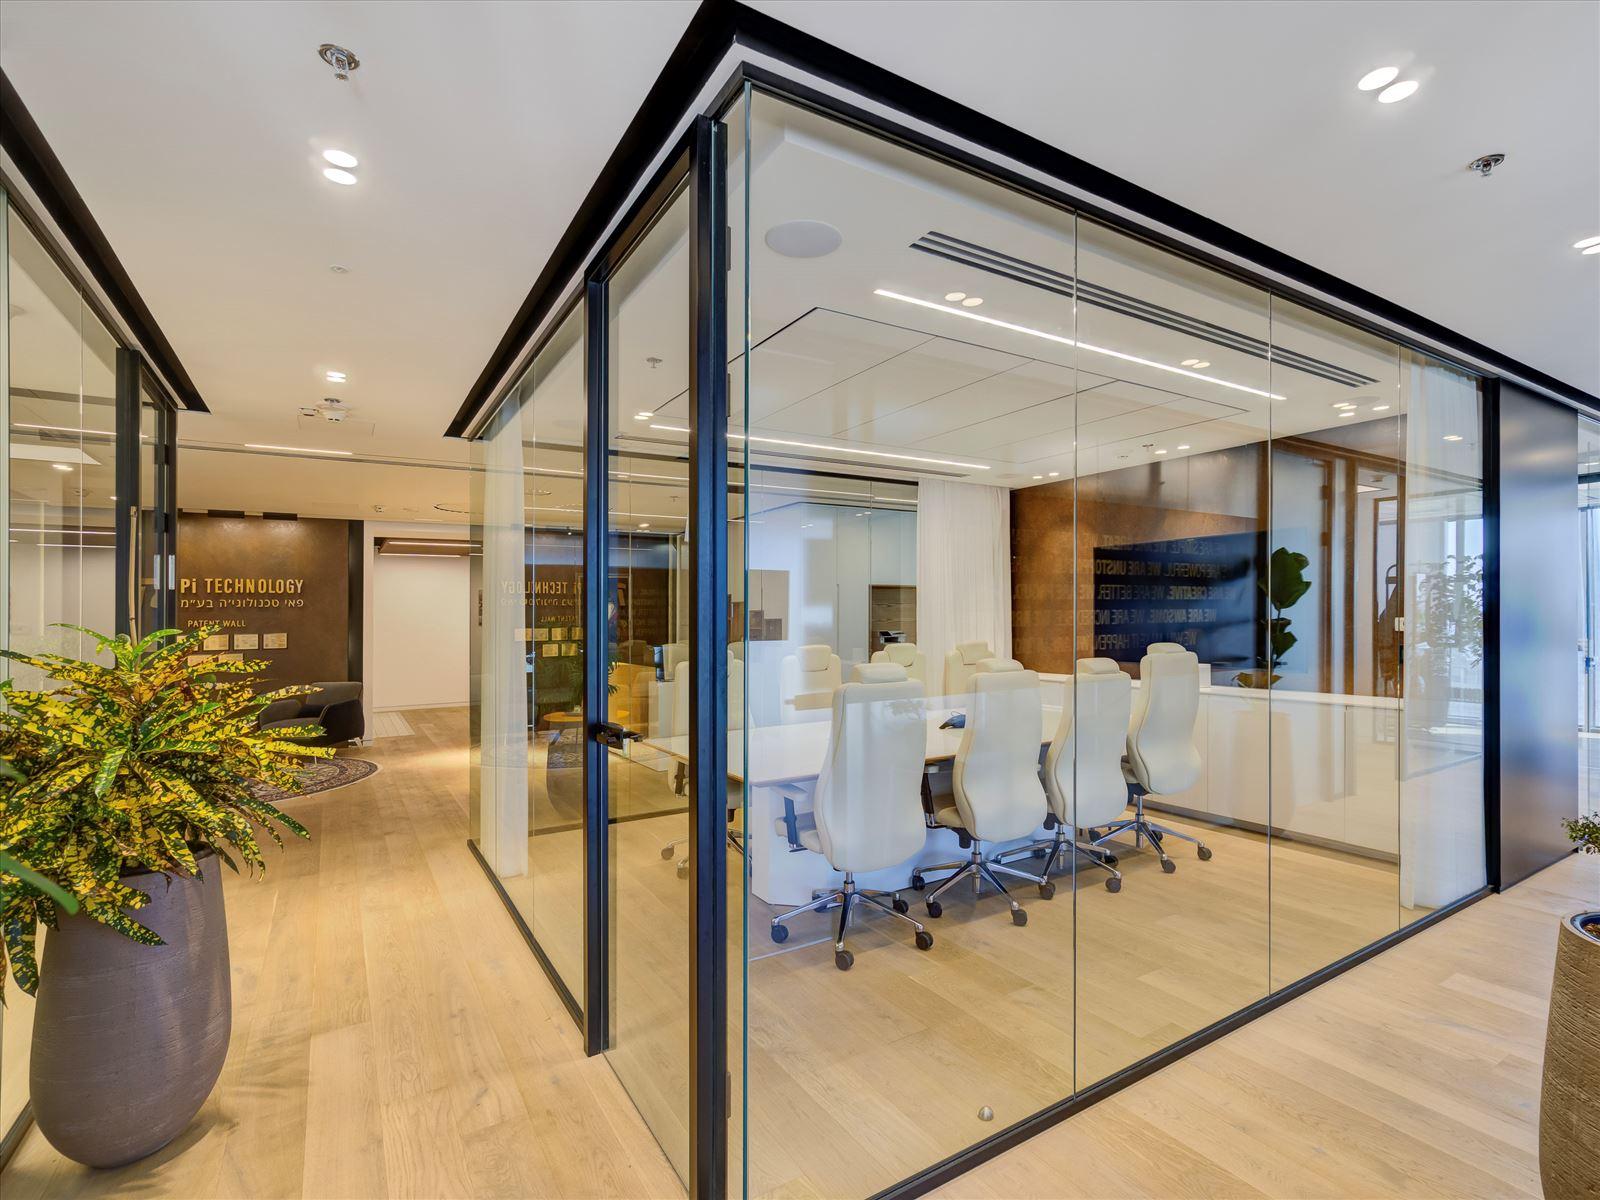 Pie Technology Office - תאורה בחלל חדר הישיבות